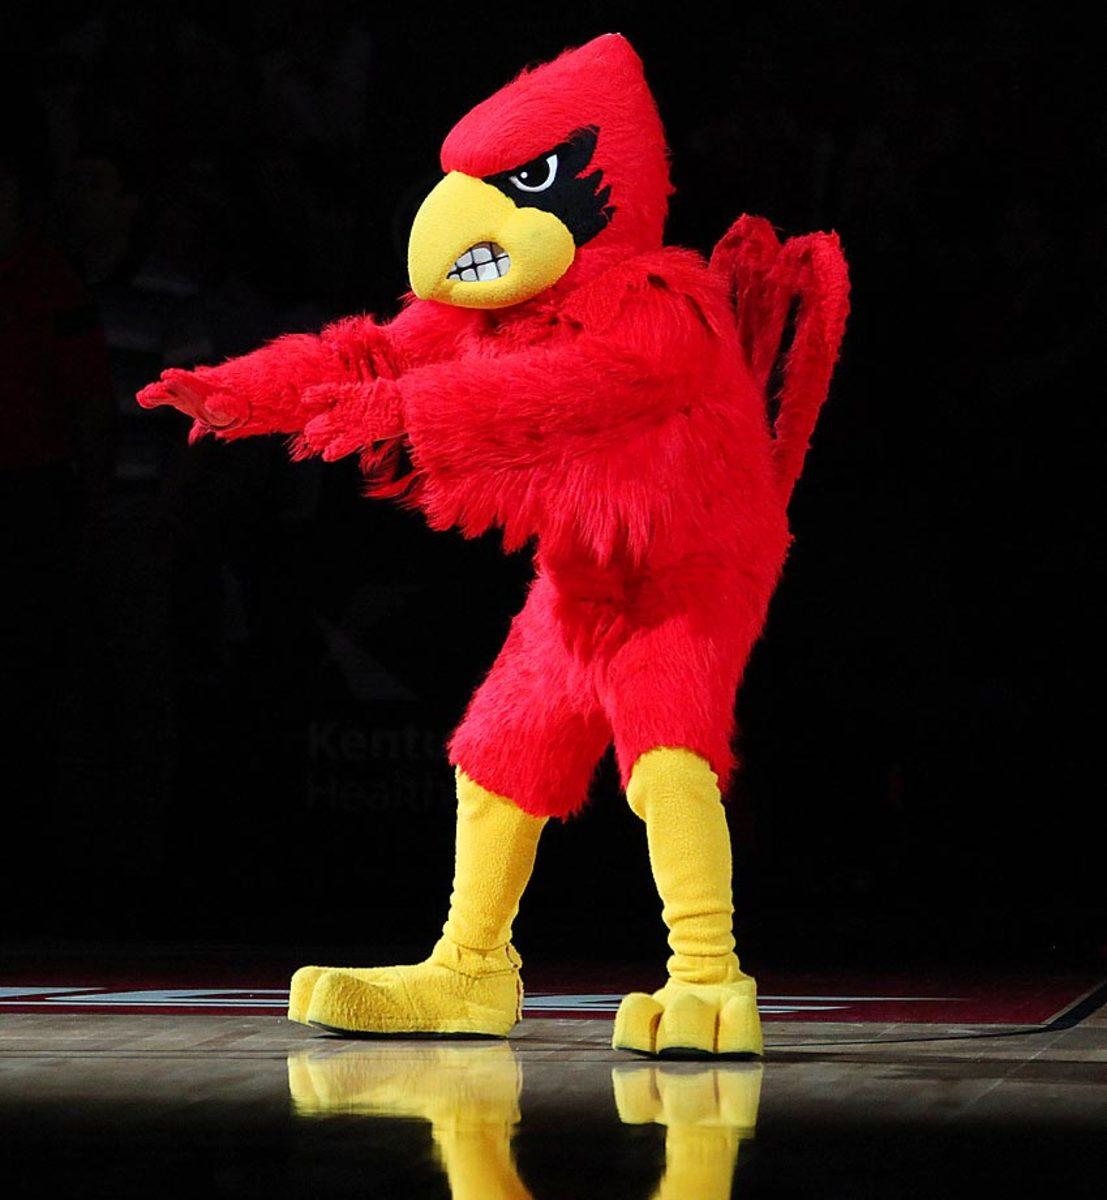 08-Louisville-mascot.jpg